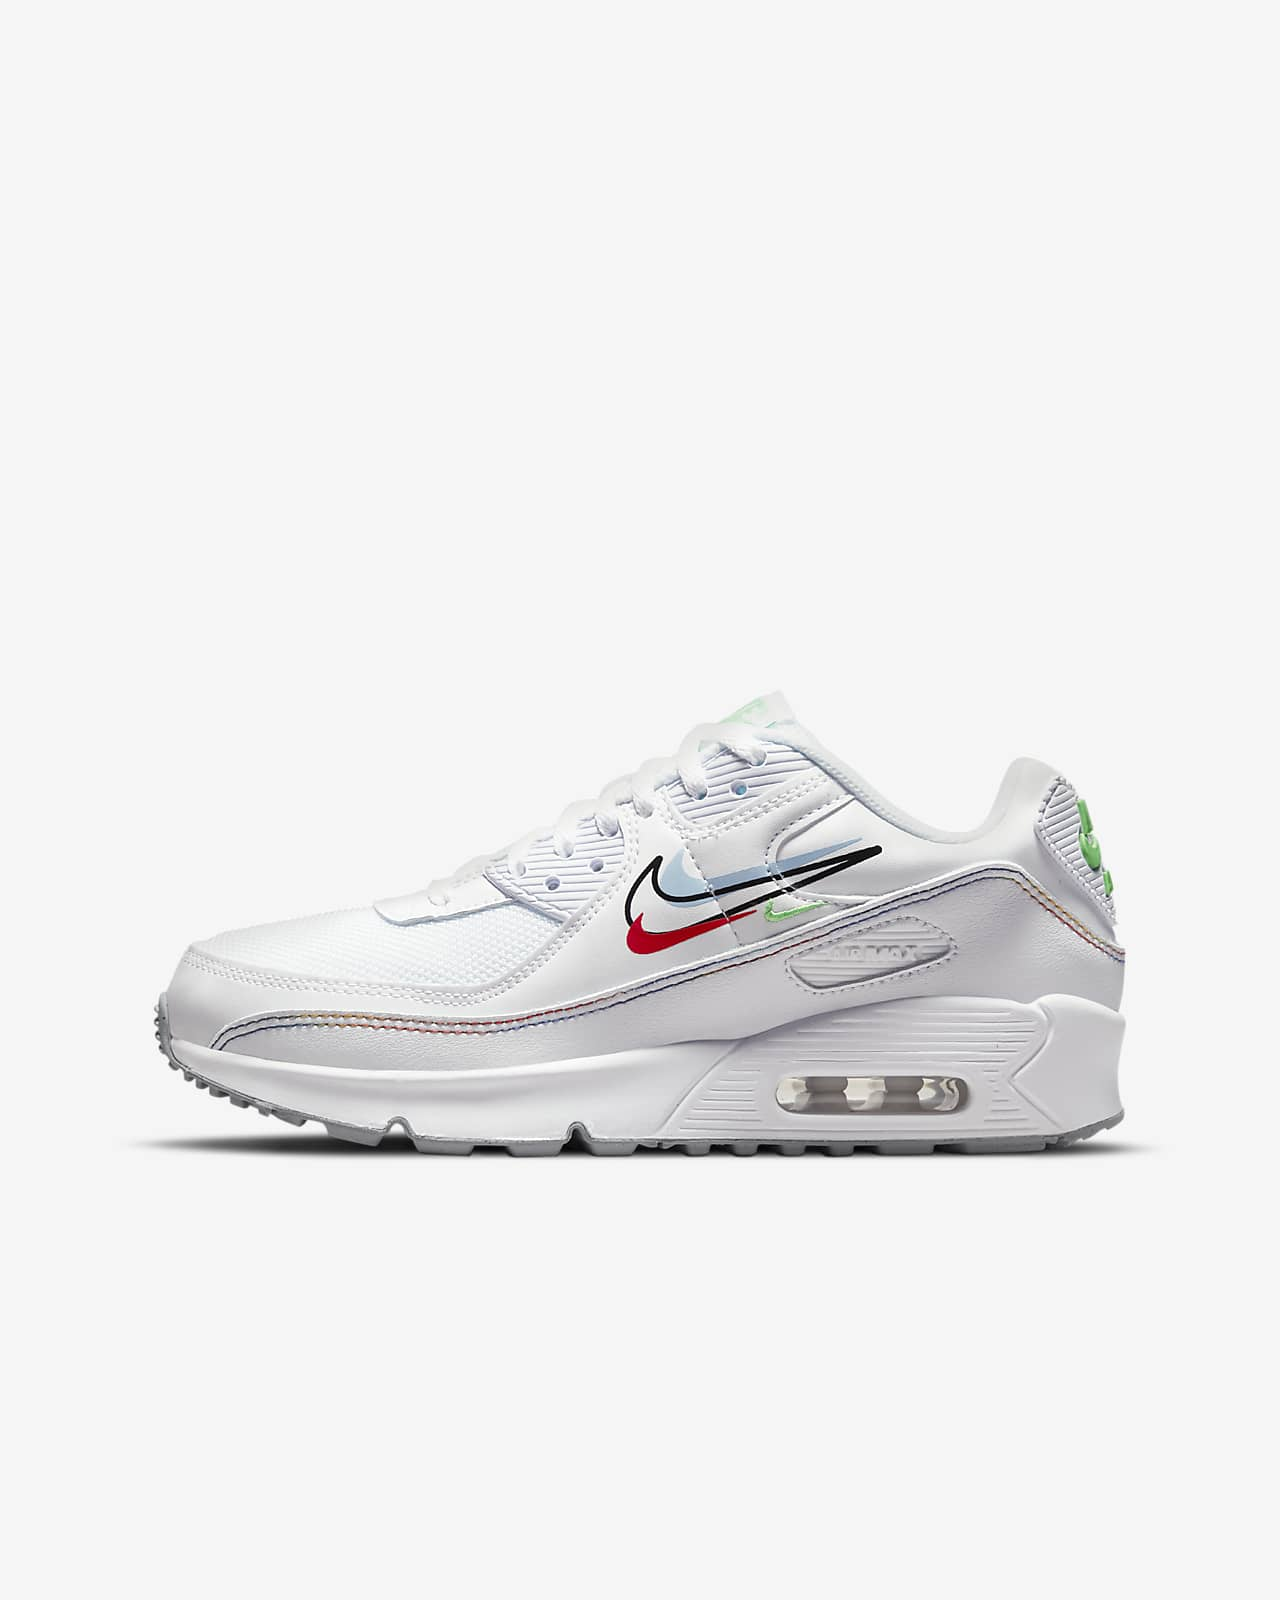 Nike Air Max 90 Schuhe für ältere Kinder